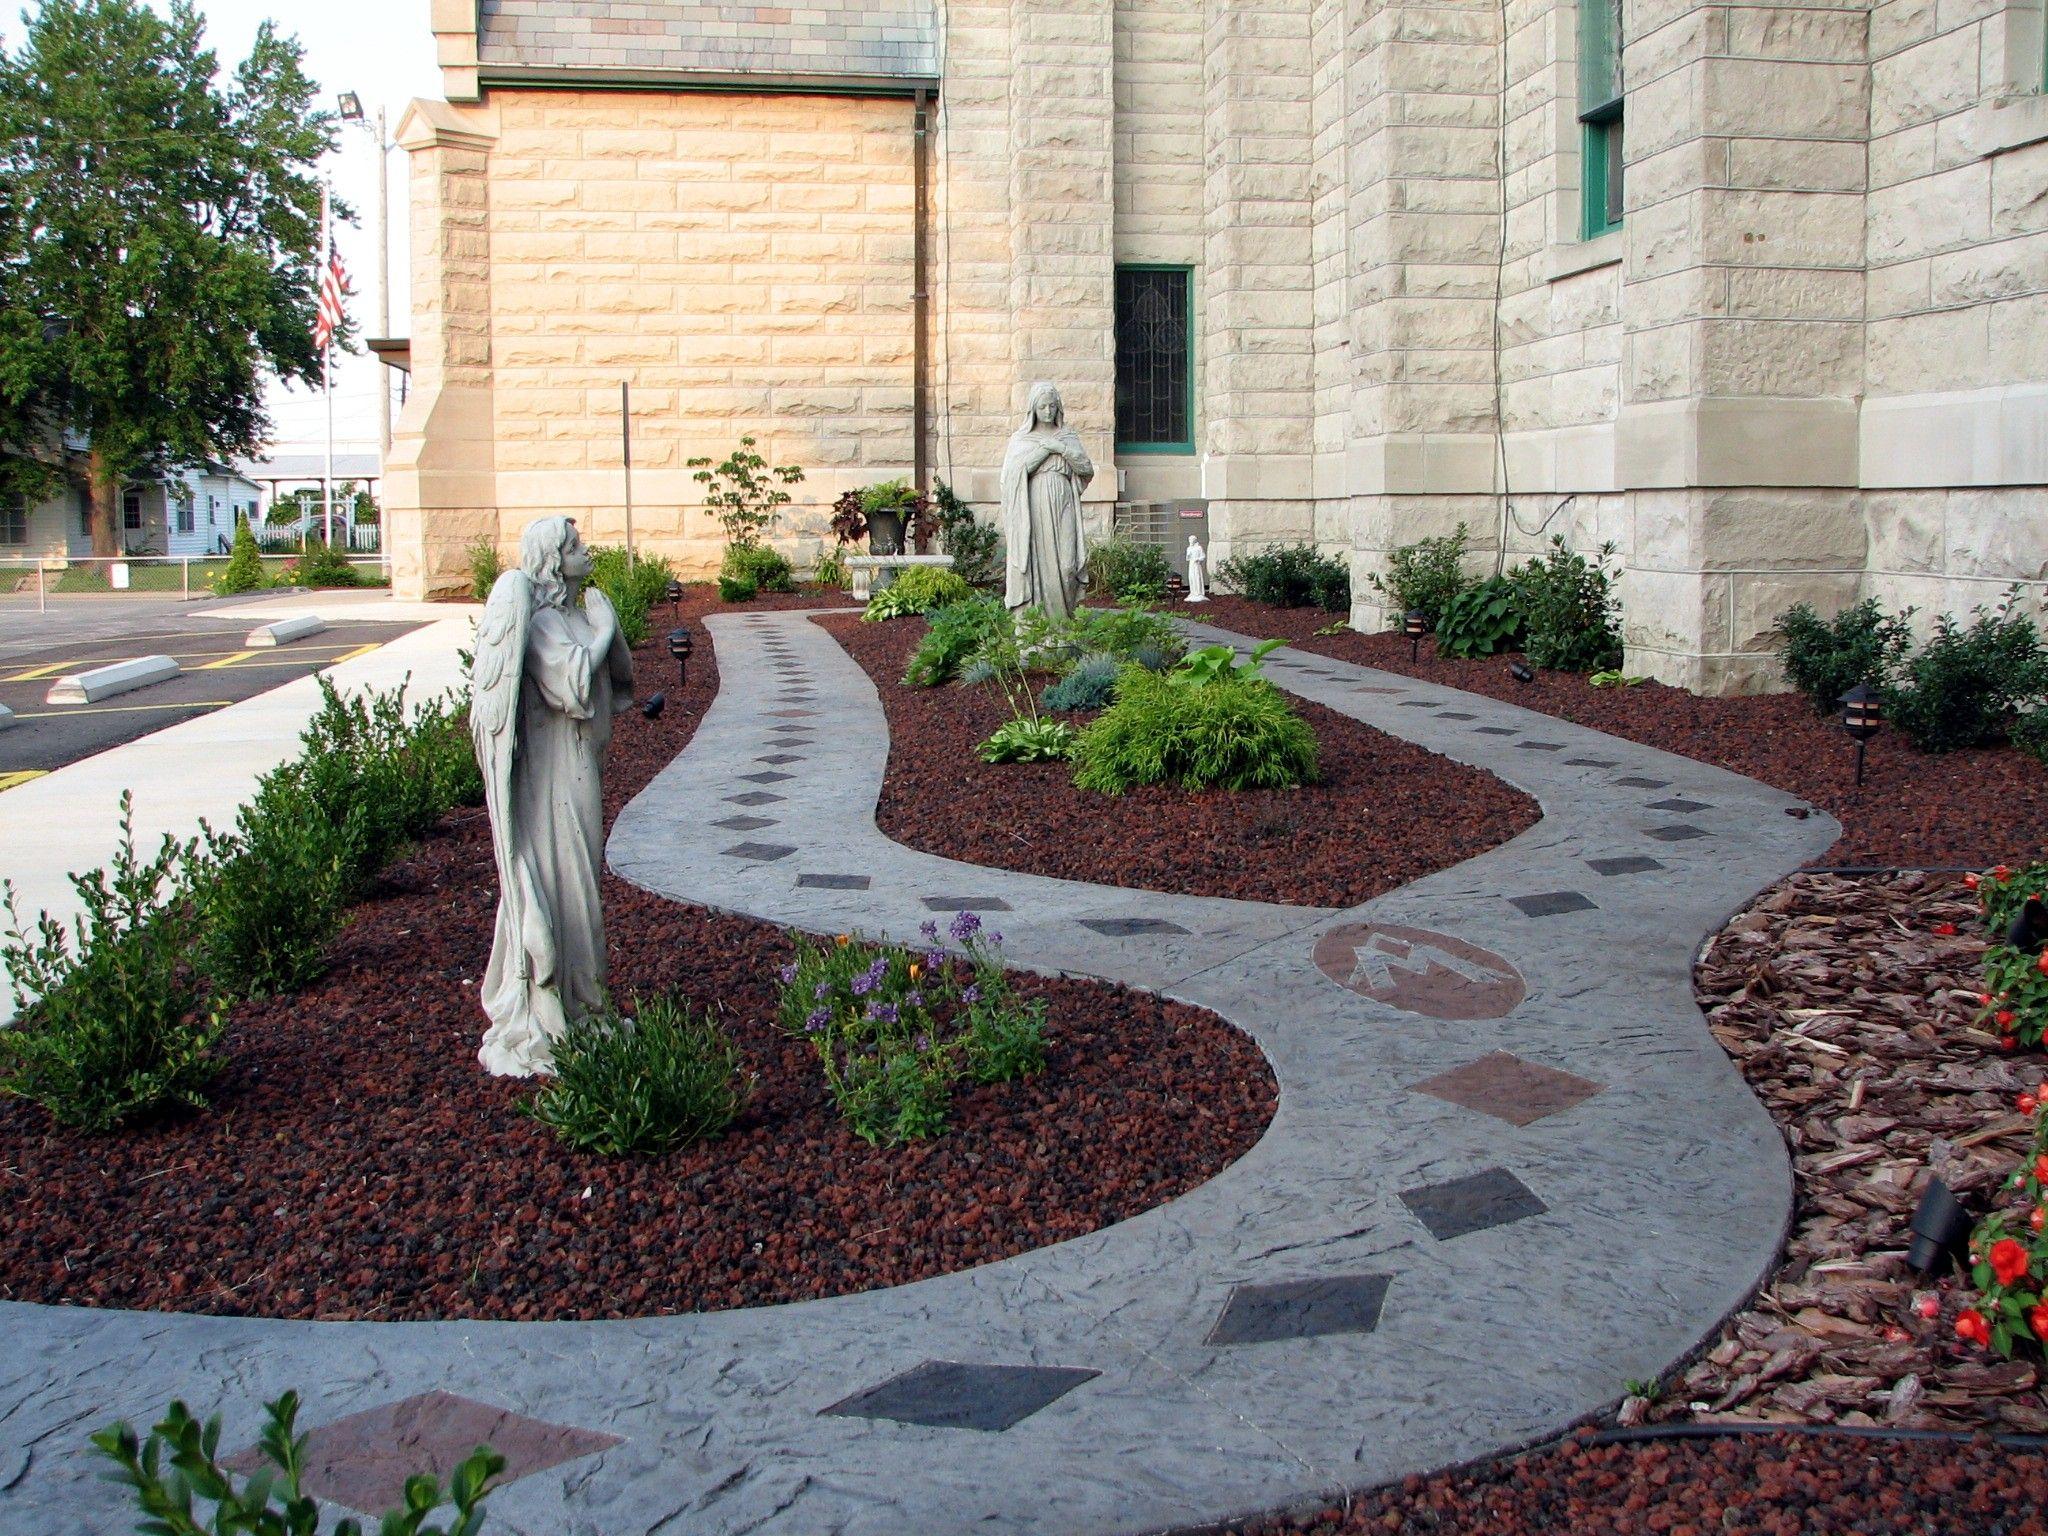 Garden Walk Inn: A Rosary Garden At St. Patrick's Catholic Church In Kokomo